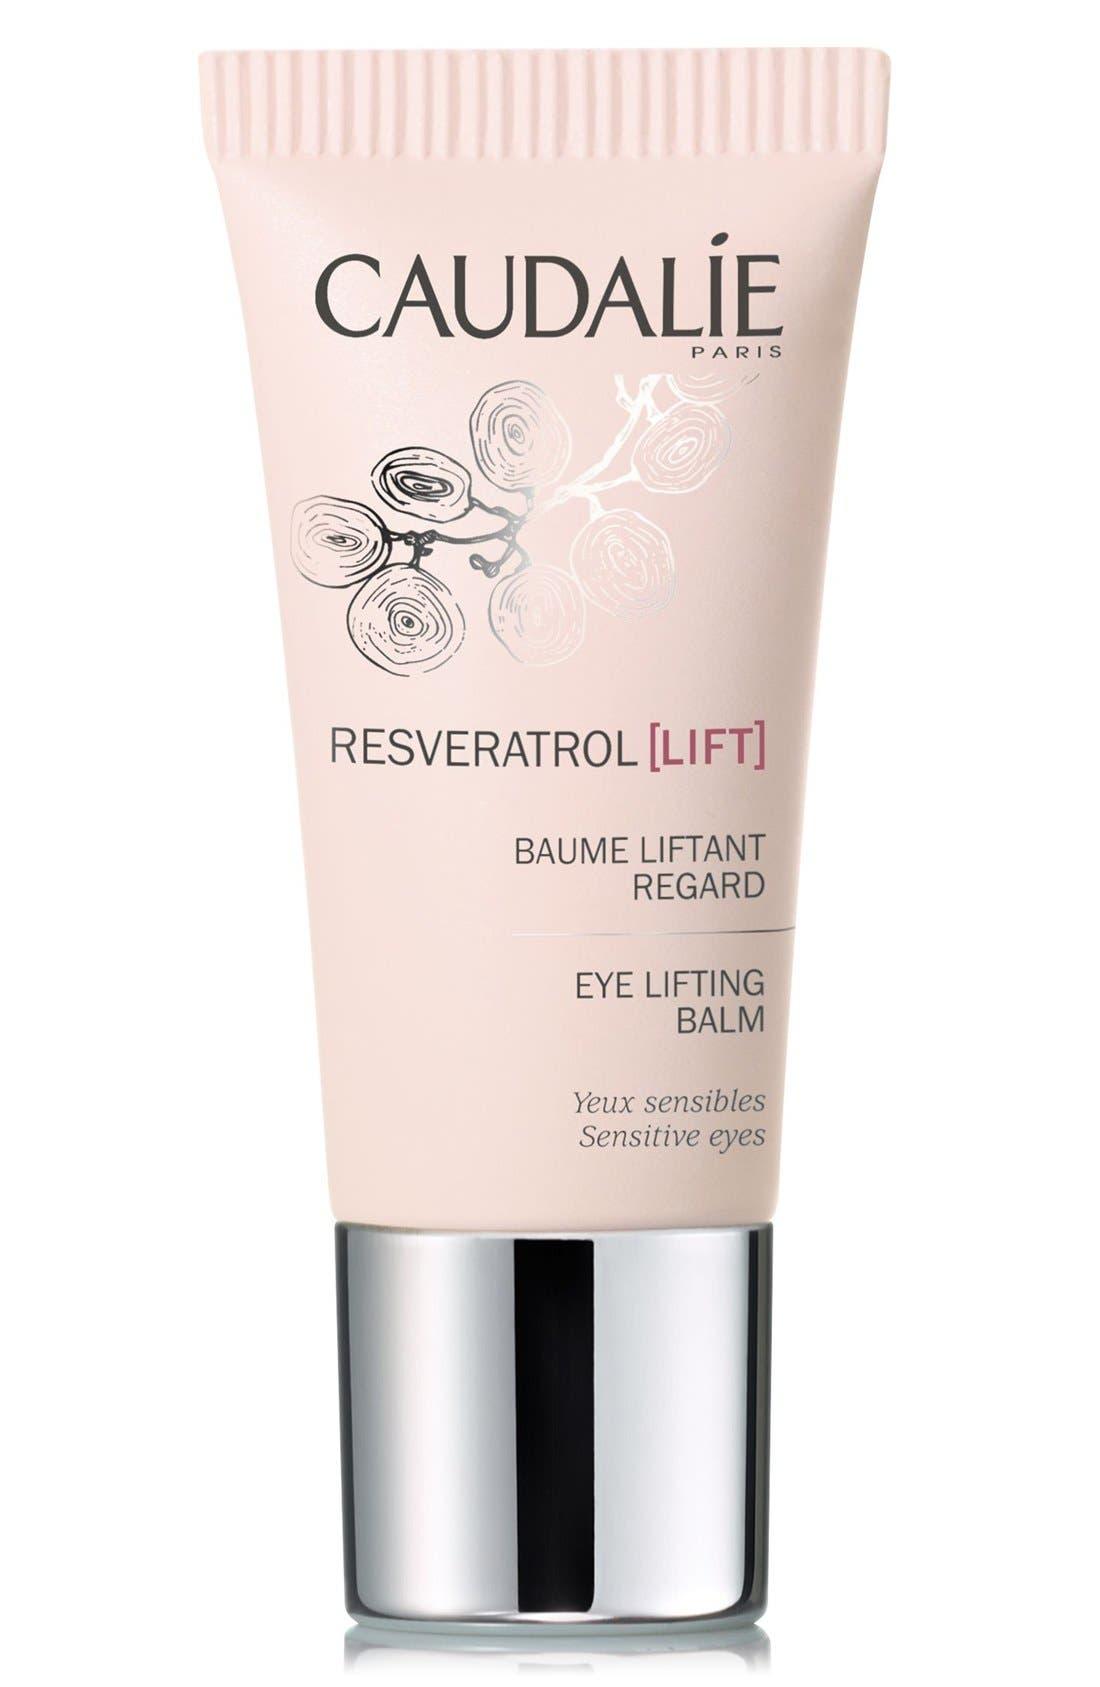 CAUDALÍE Resveratrol Lift Eye Lifting Balm